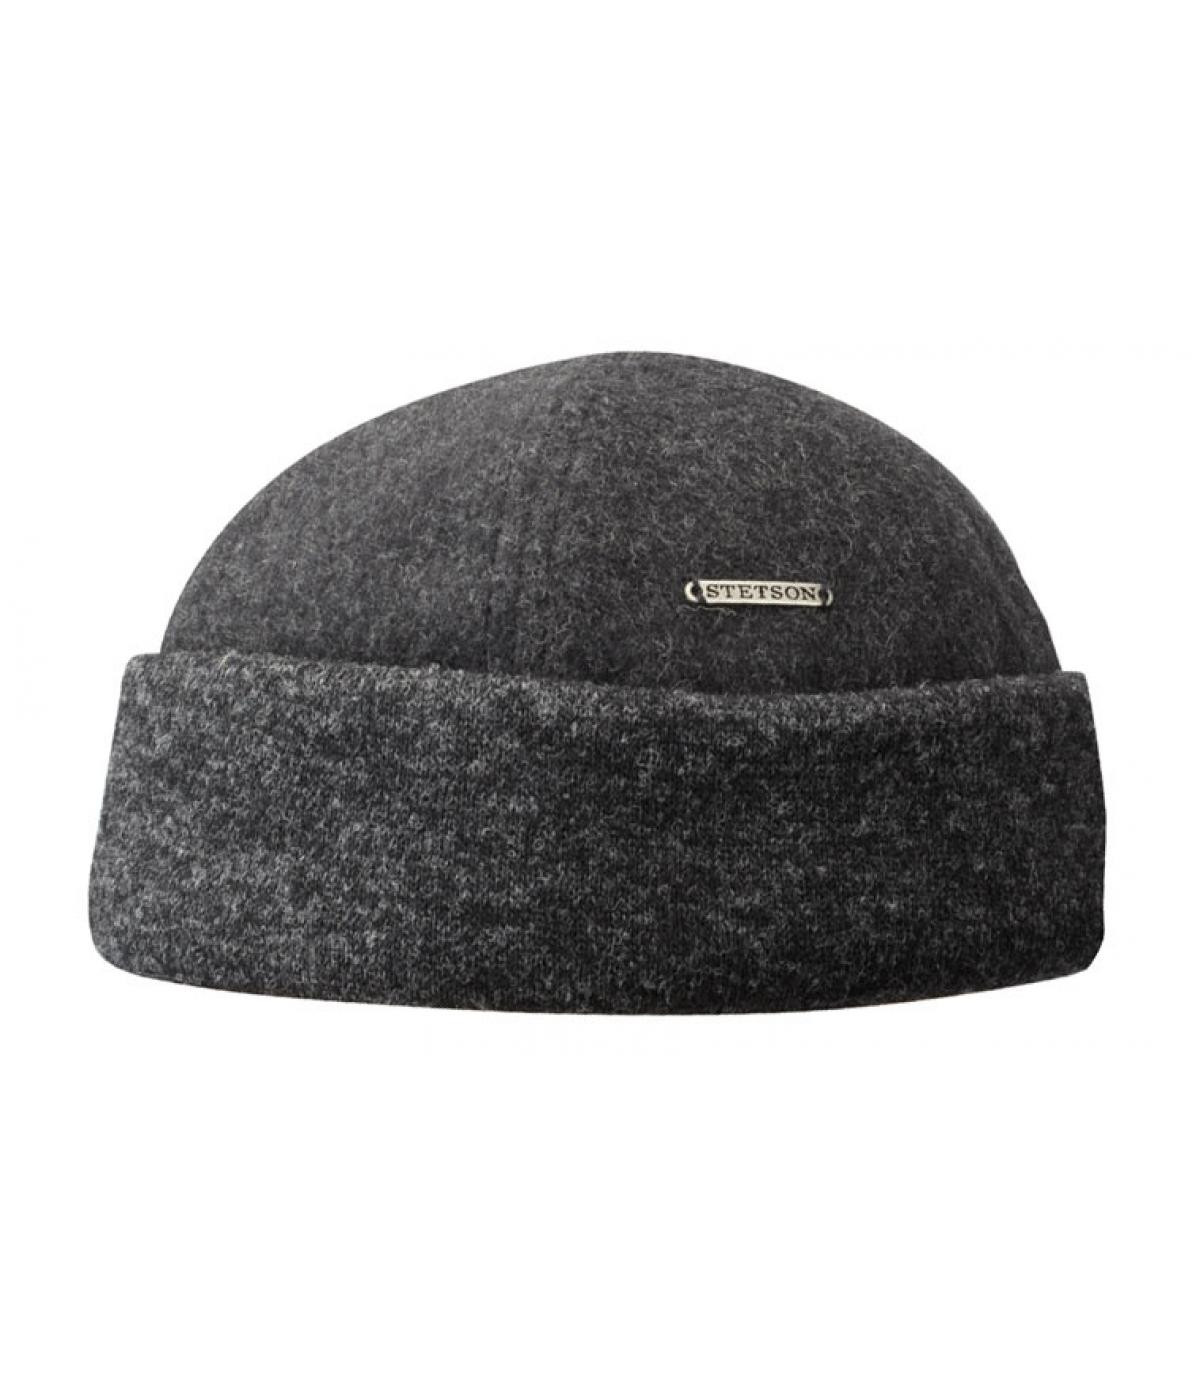 Détails Docker Wool Cashmere grey - image 2